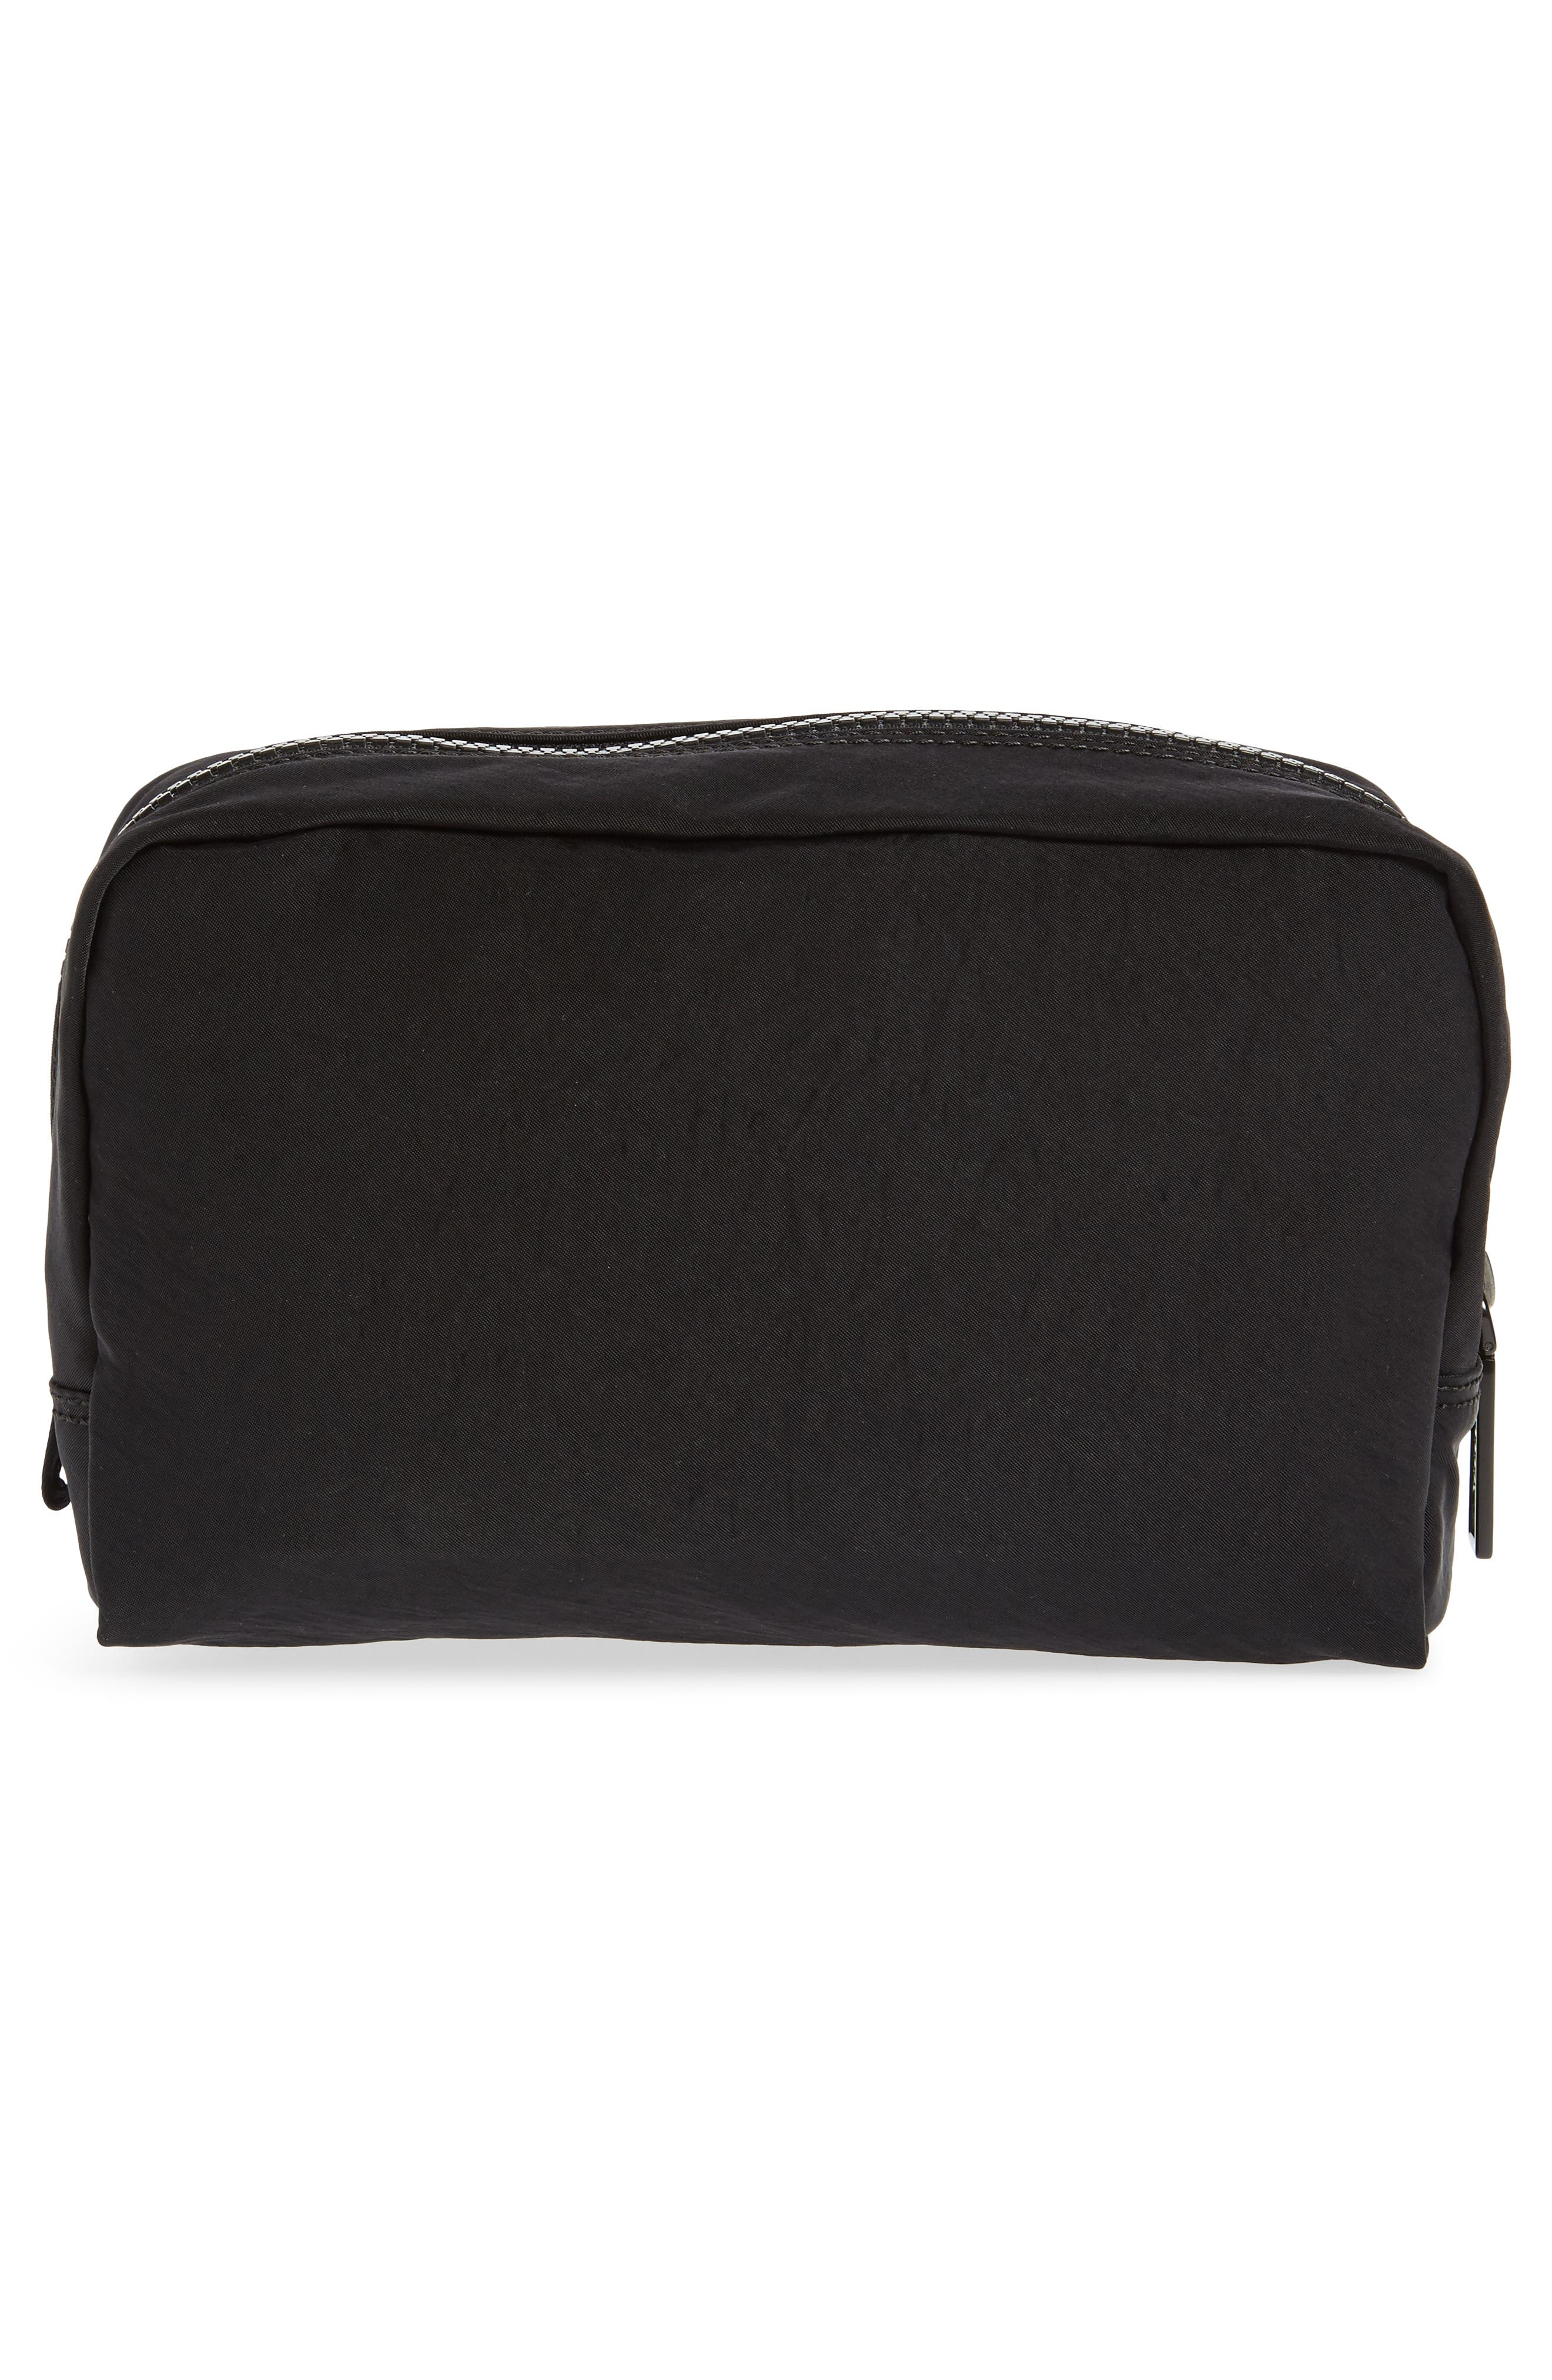 Nylon Cosmetics Pouch,                             Alternate thumbnail 2, color,                             BLACK